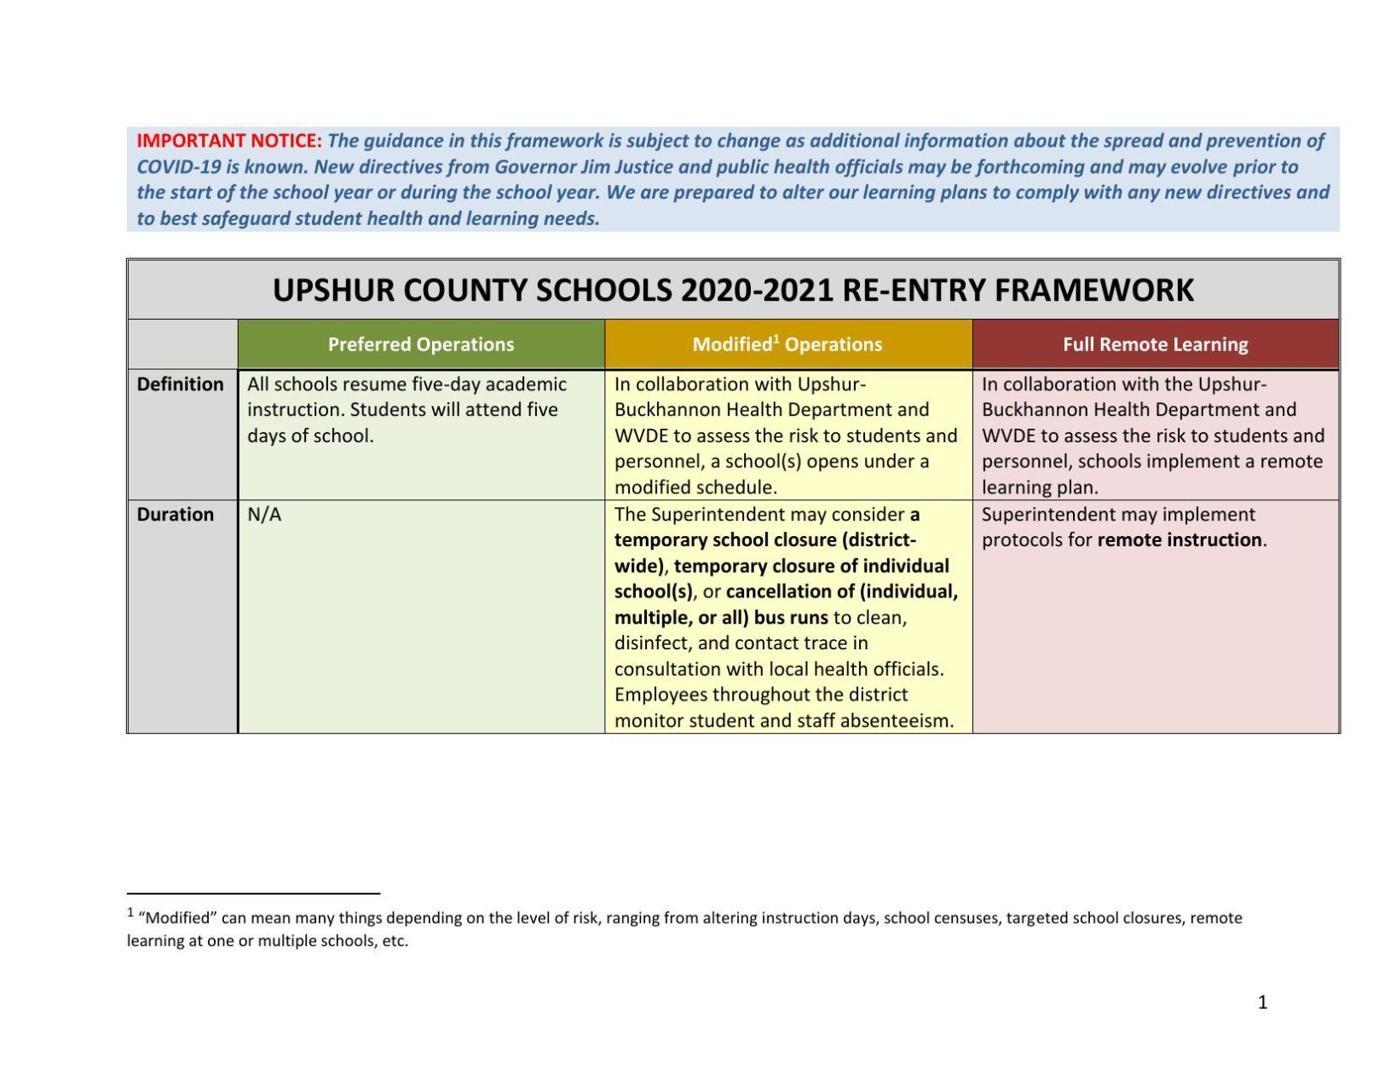 Upshur County Schools Re-Entry Framework